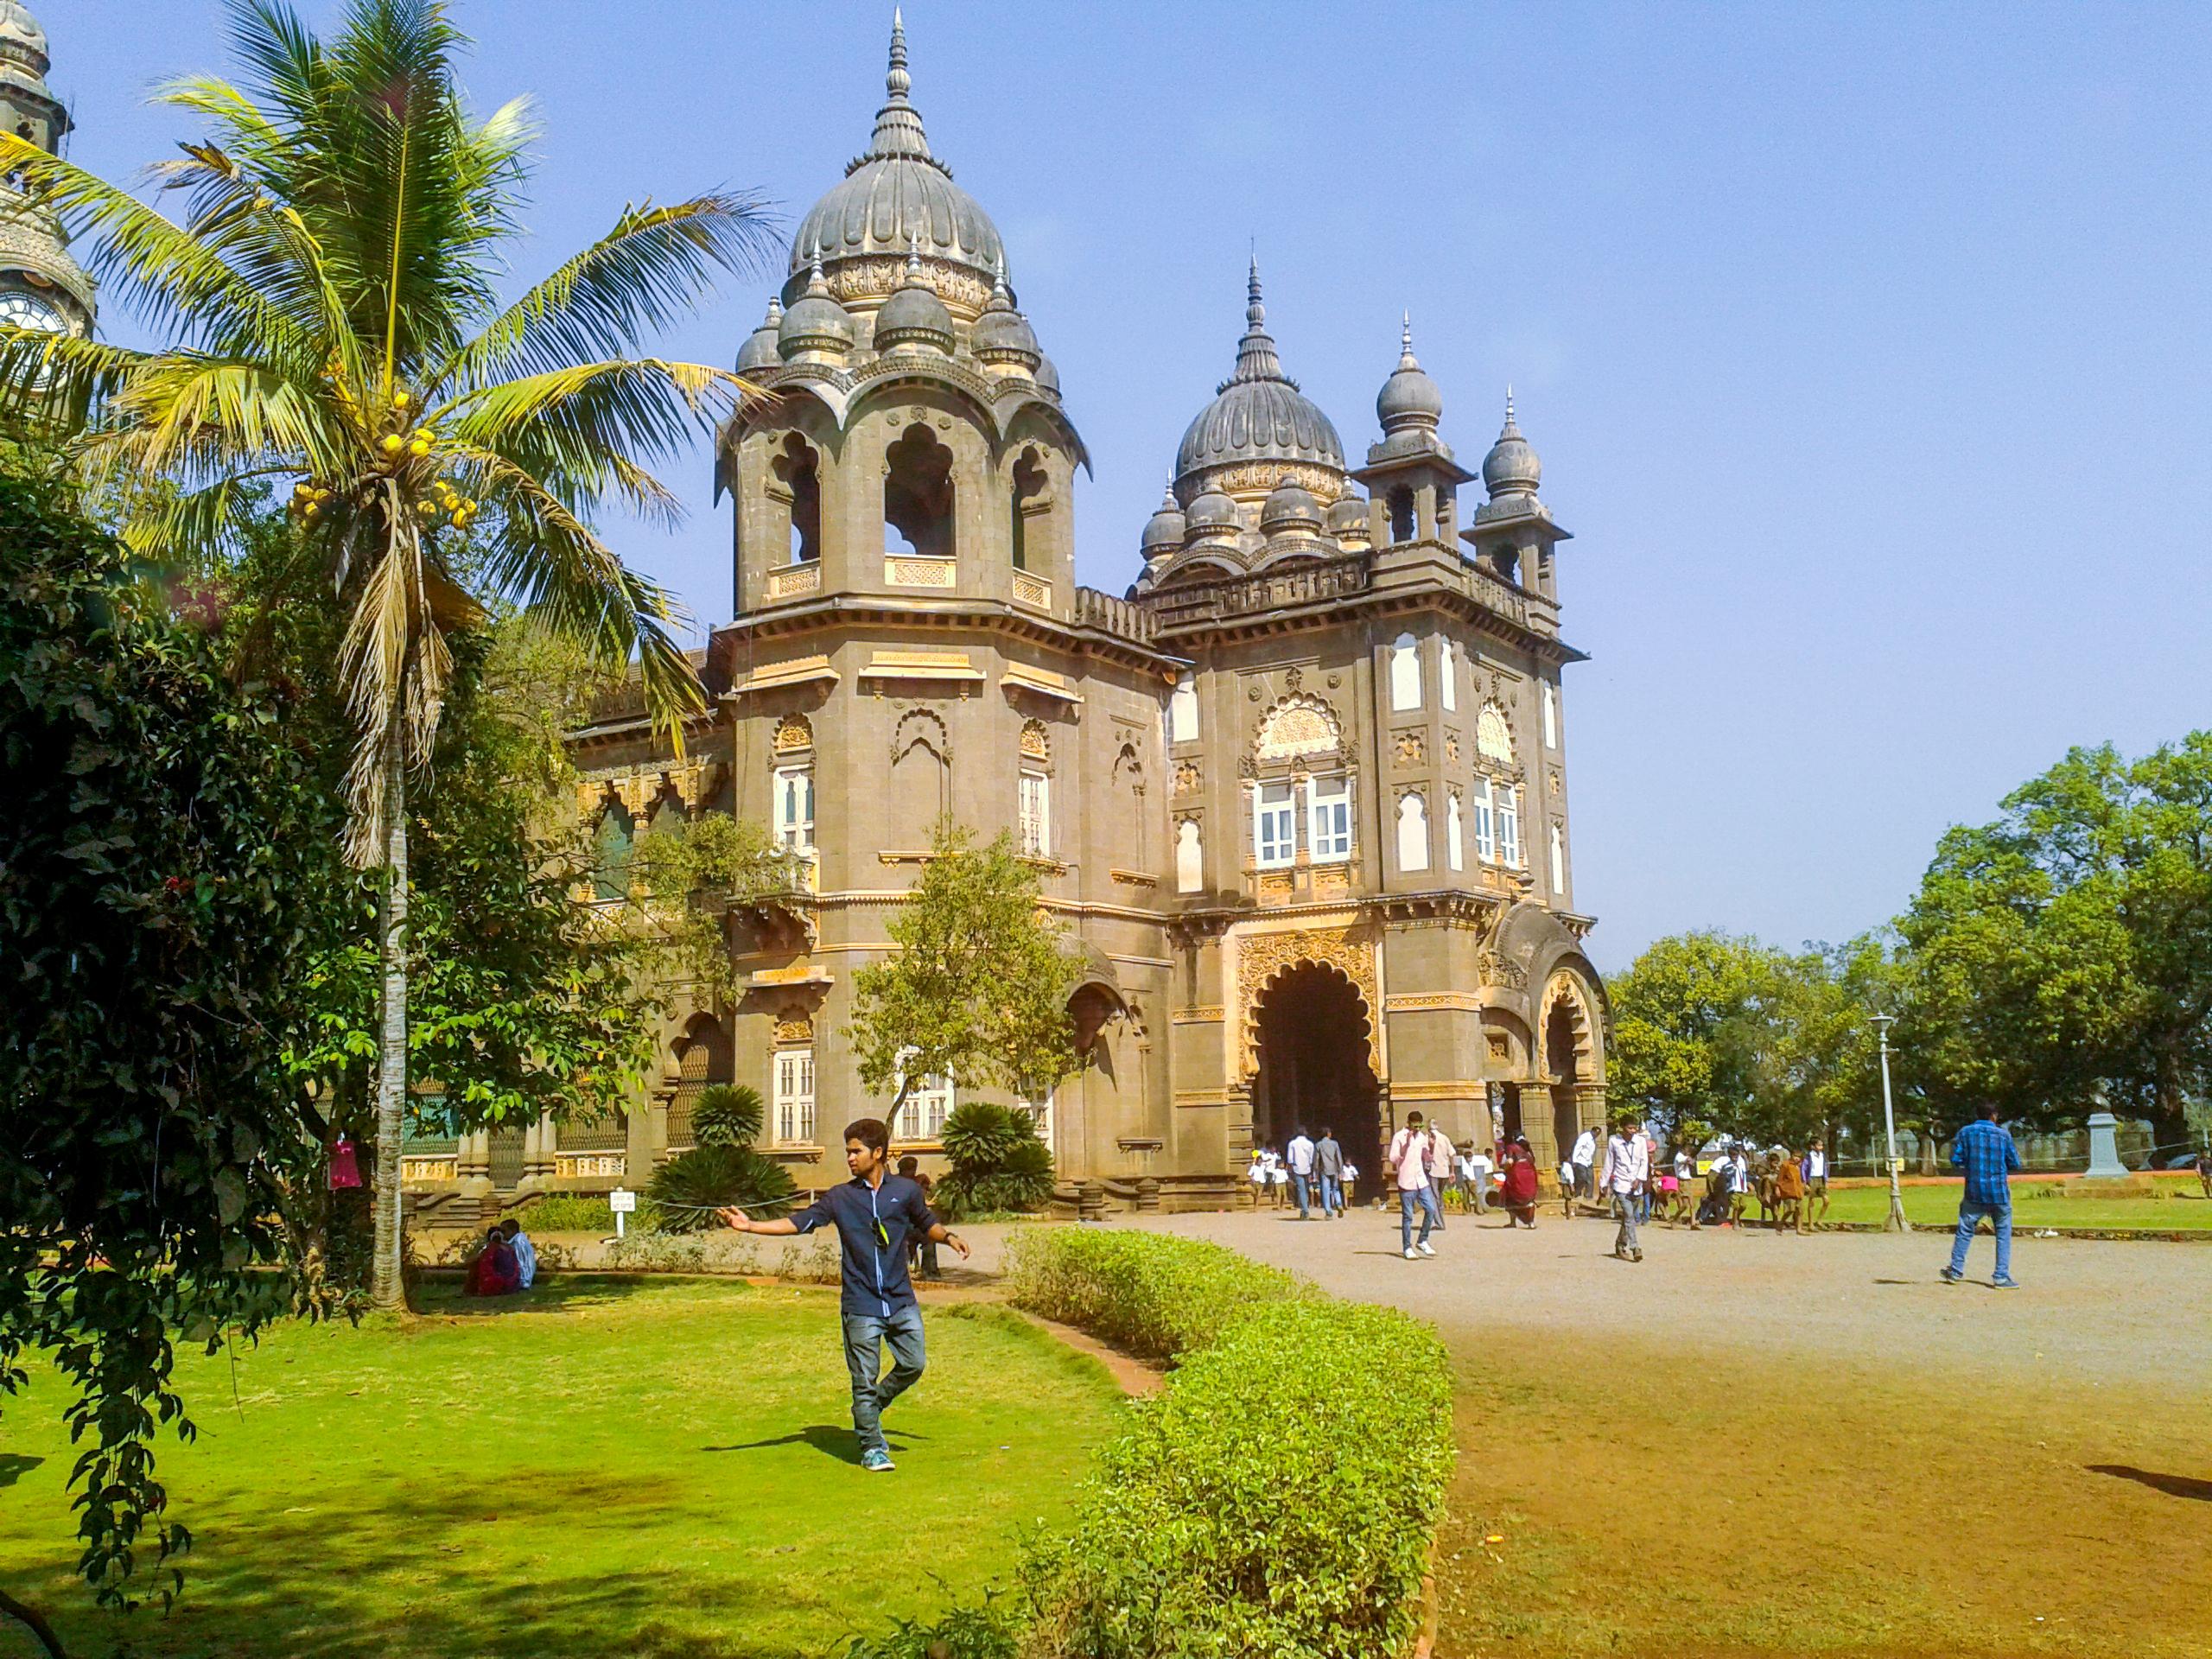 A royal palace